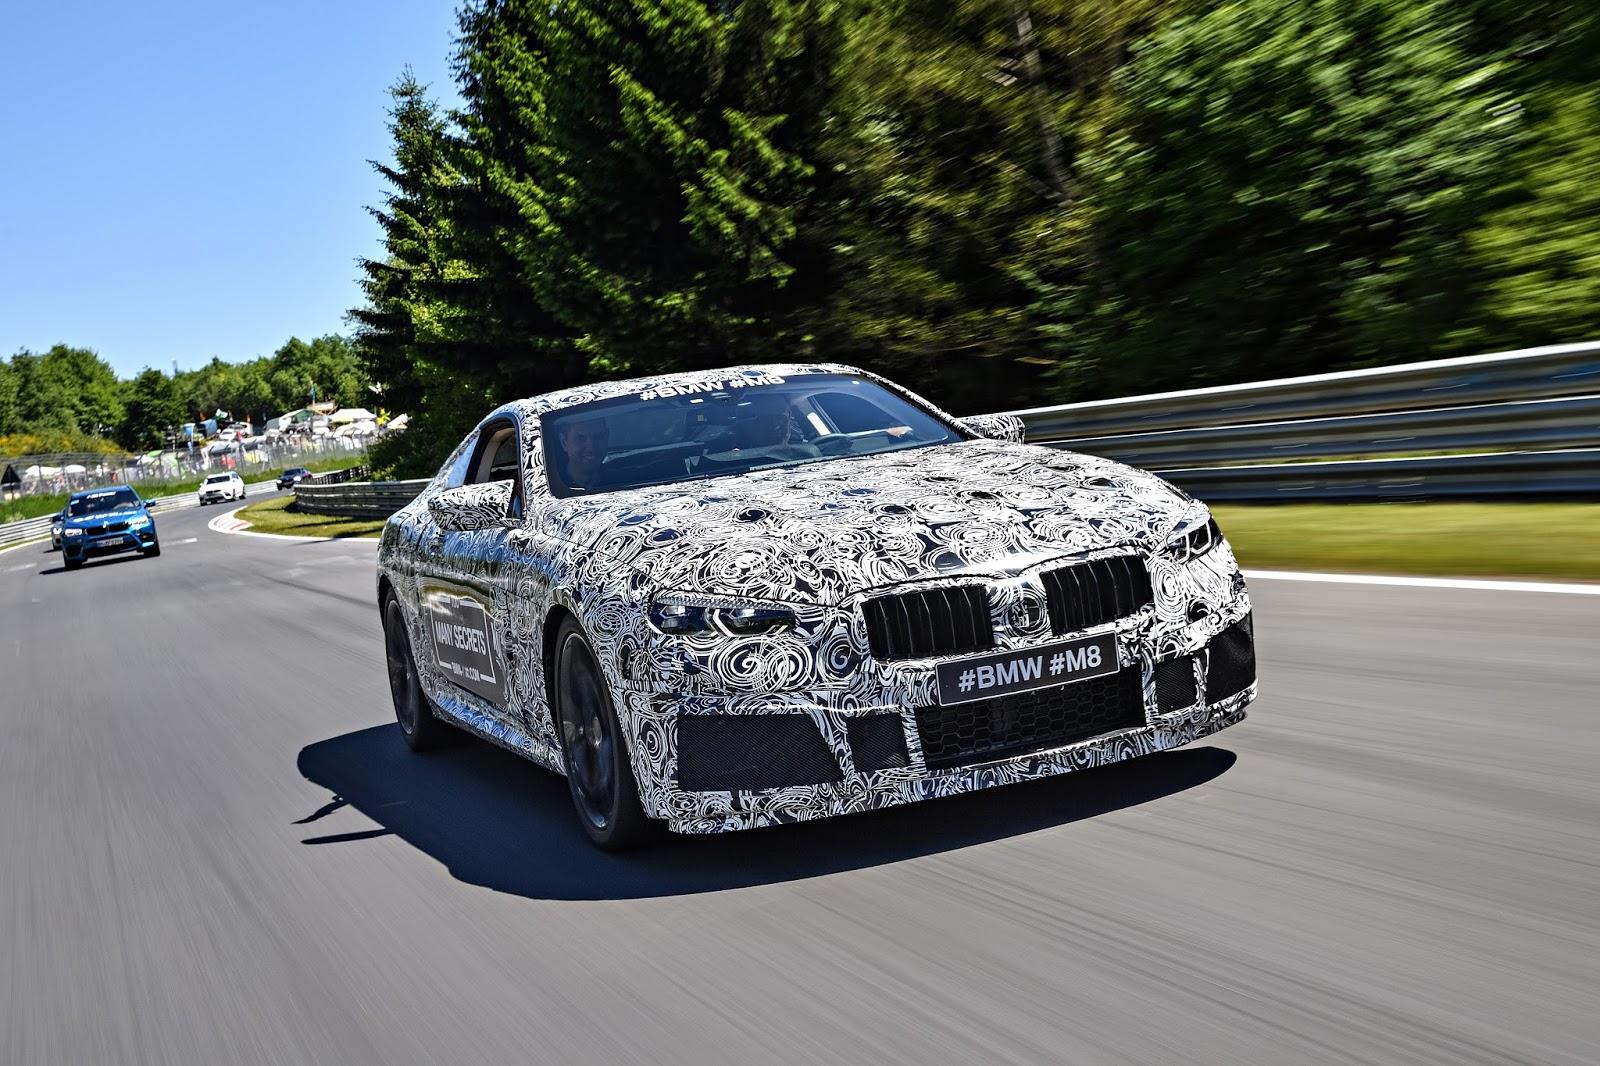 P90261507 highRes m festival bmw m8 pr 1 H ναυαρχίδα της BMW, η M8 θα είναι οκτακύλινδρη BMW, BMW Concept, BMW Concept 8 Series, BMW M, BMW M Performance, BMW M8